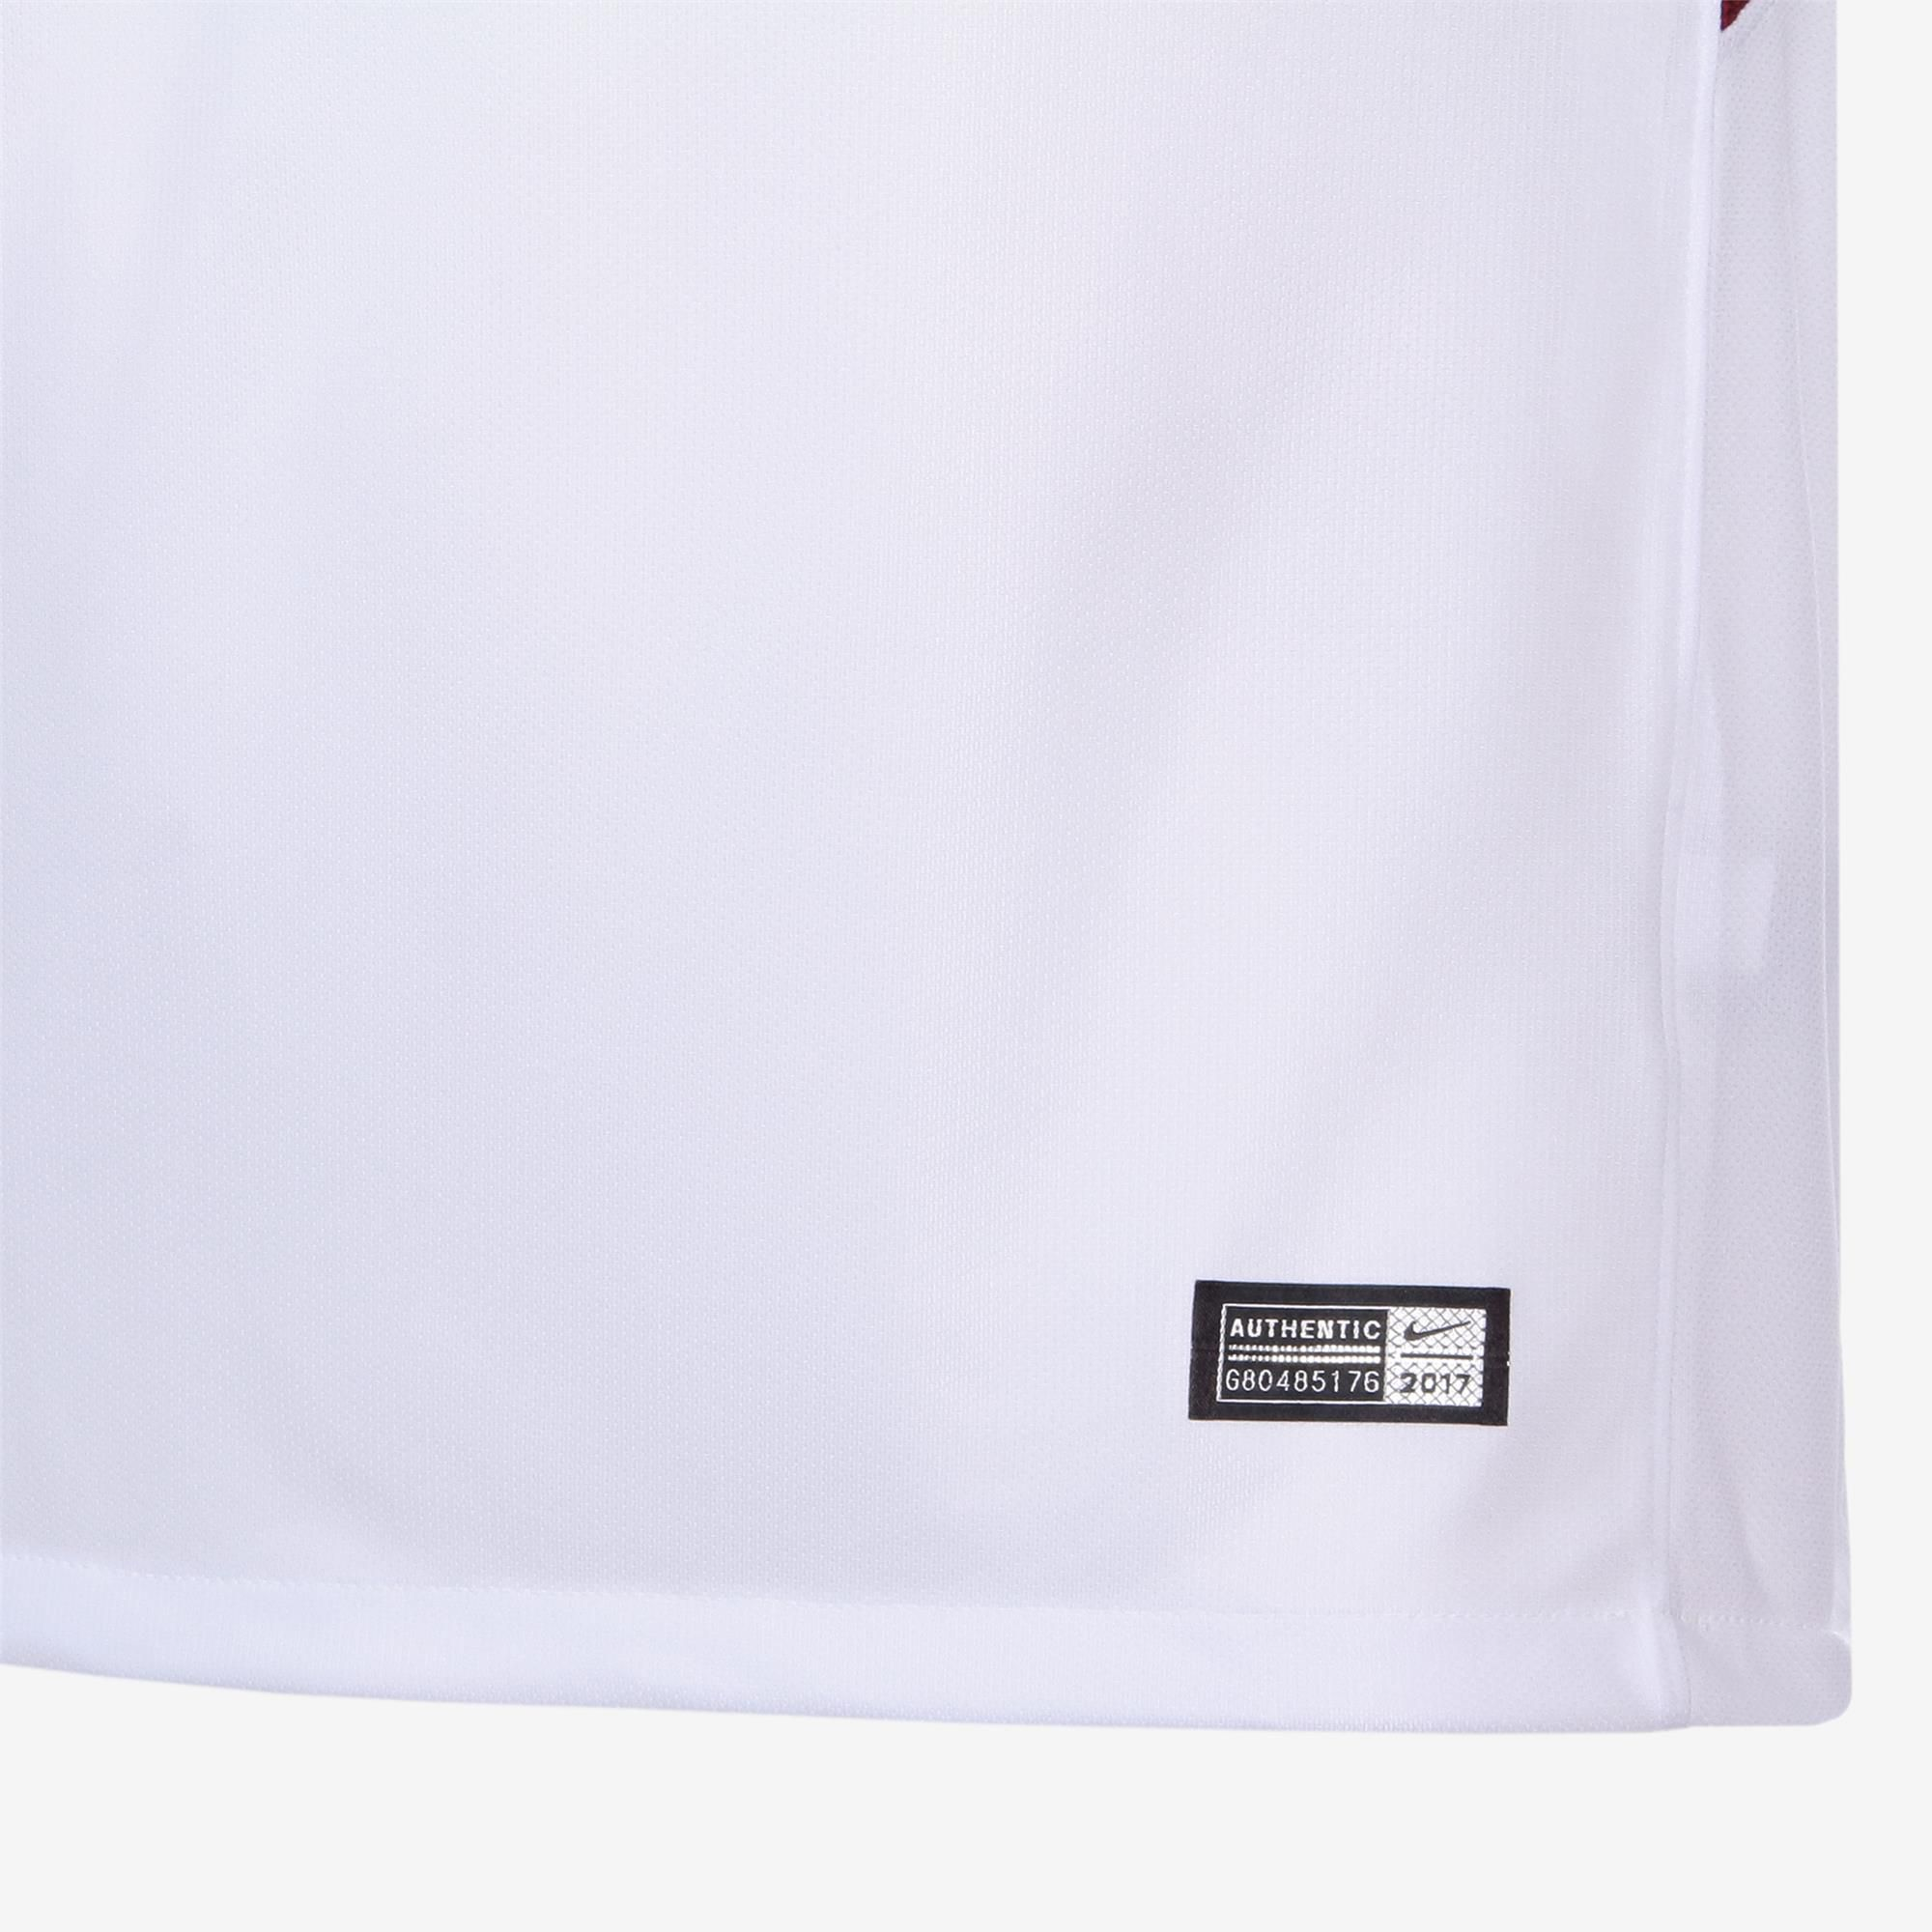 a316d99211 Camisa Nike Internacional Ii 17 18 S n° Torcedor - BRACIA SHOP  Loja ...